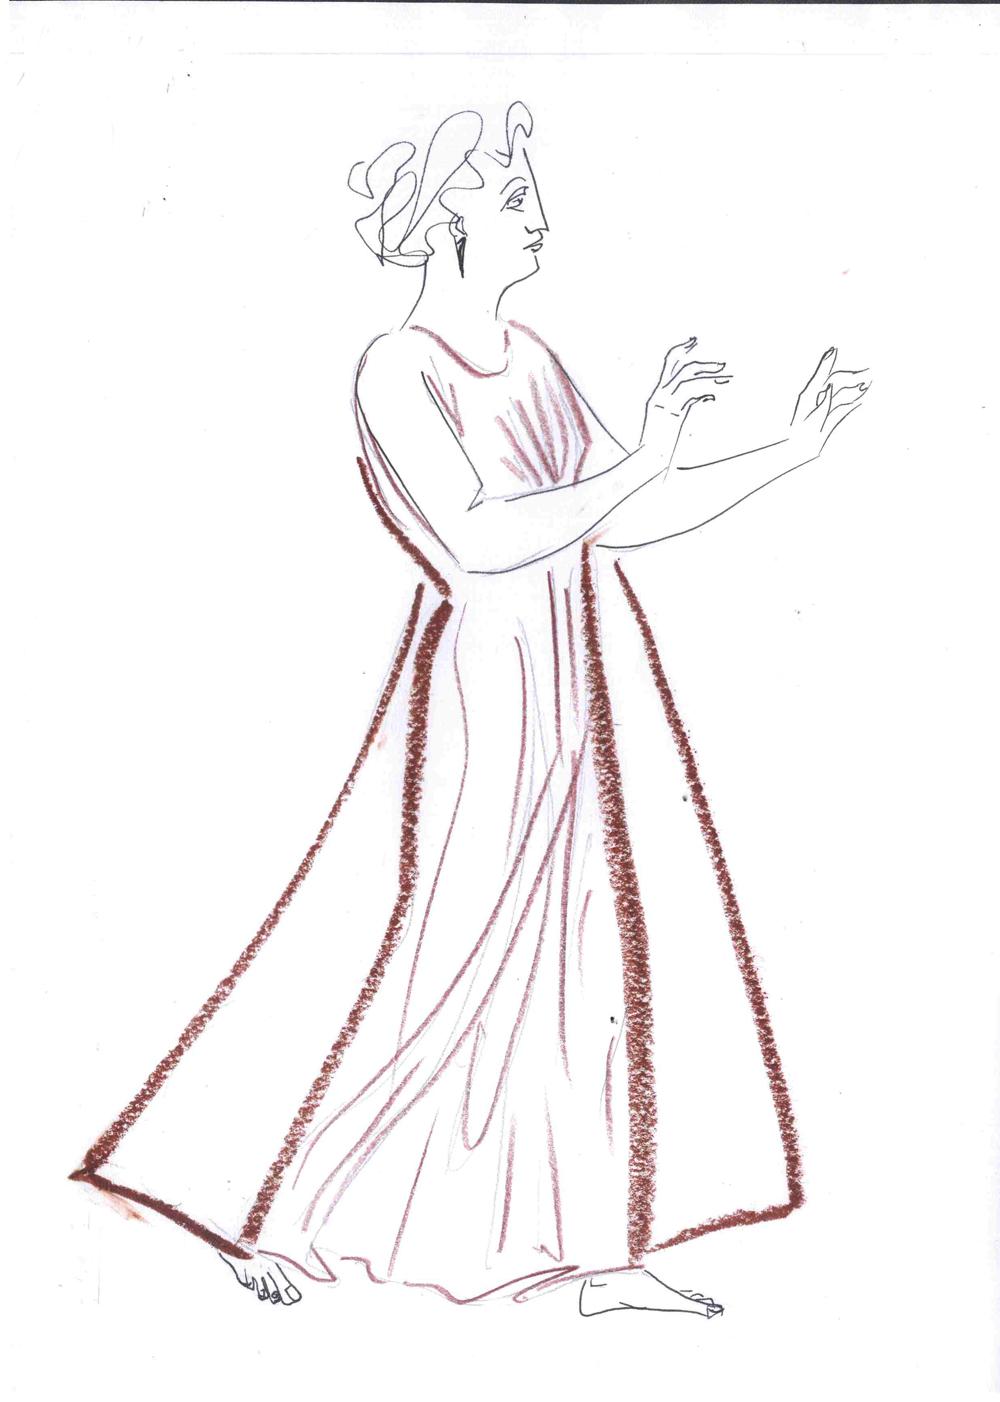 Dido & Aeneas Sofia Lasserrot 9.jpg